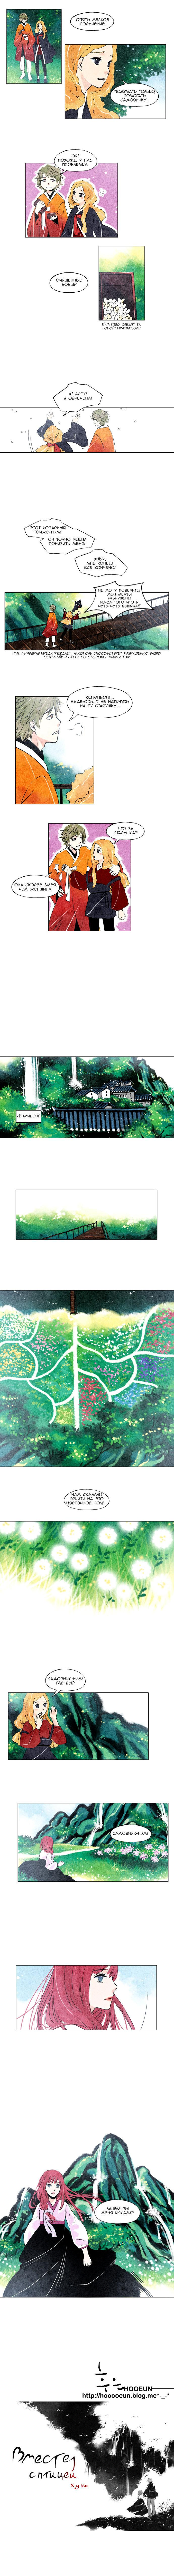 https://r1.ninemanga.com/comics/pic2/39/22503/238791/1430260546309.jpg Page 5